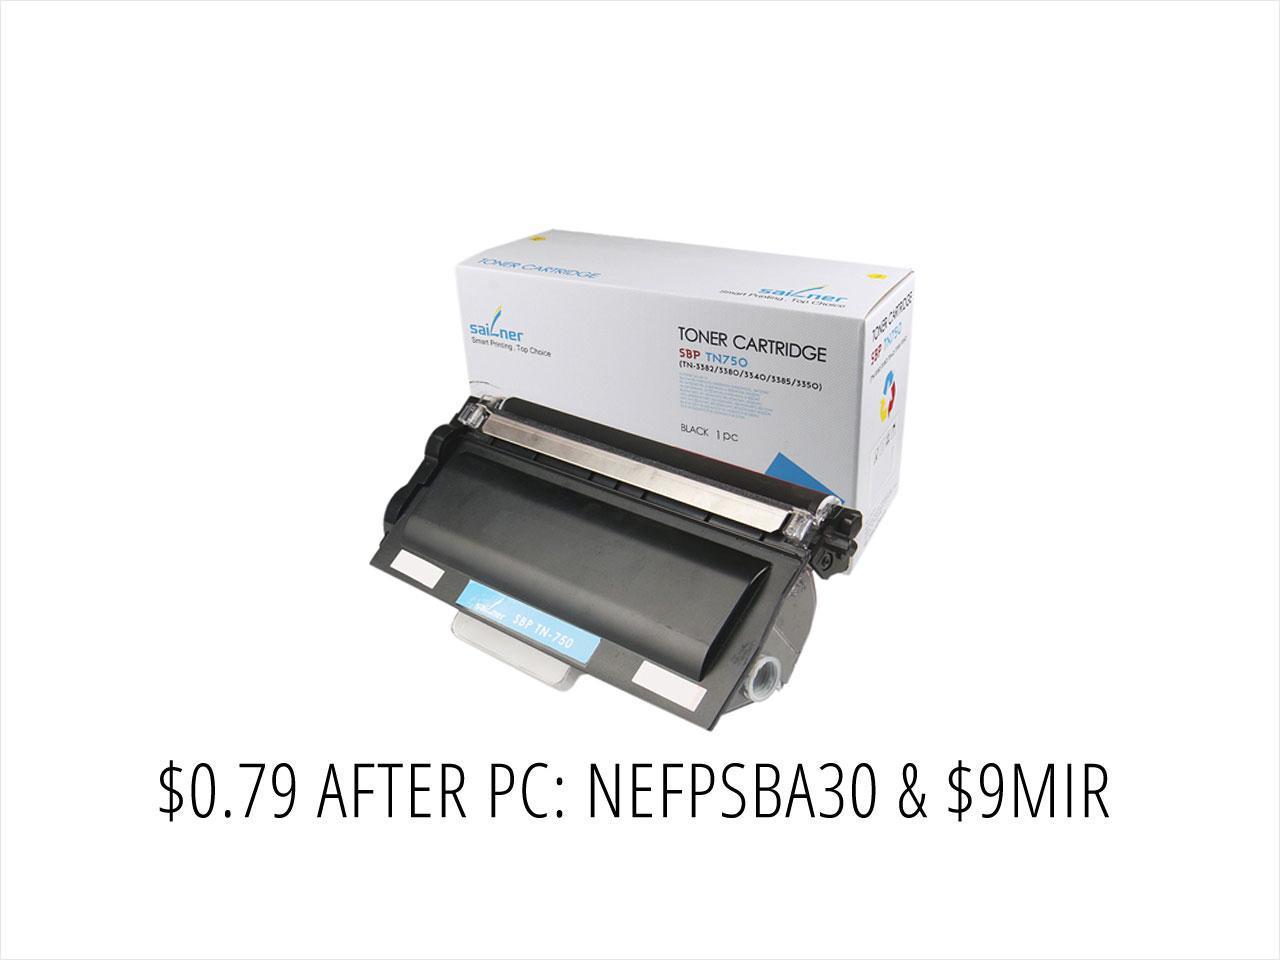 Sailner Compatible SBP-TN-750 Toner Cartridge (Brother Replacement) $0.79AR @NF